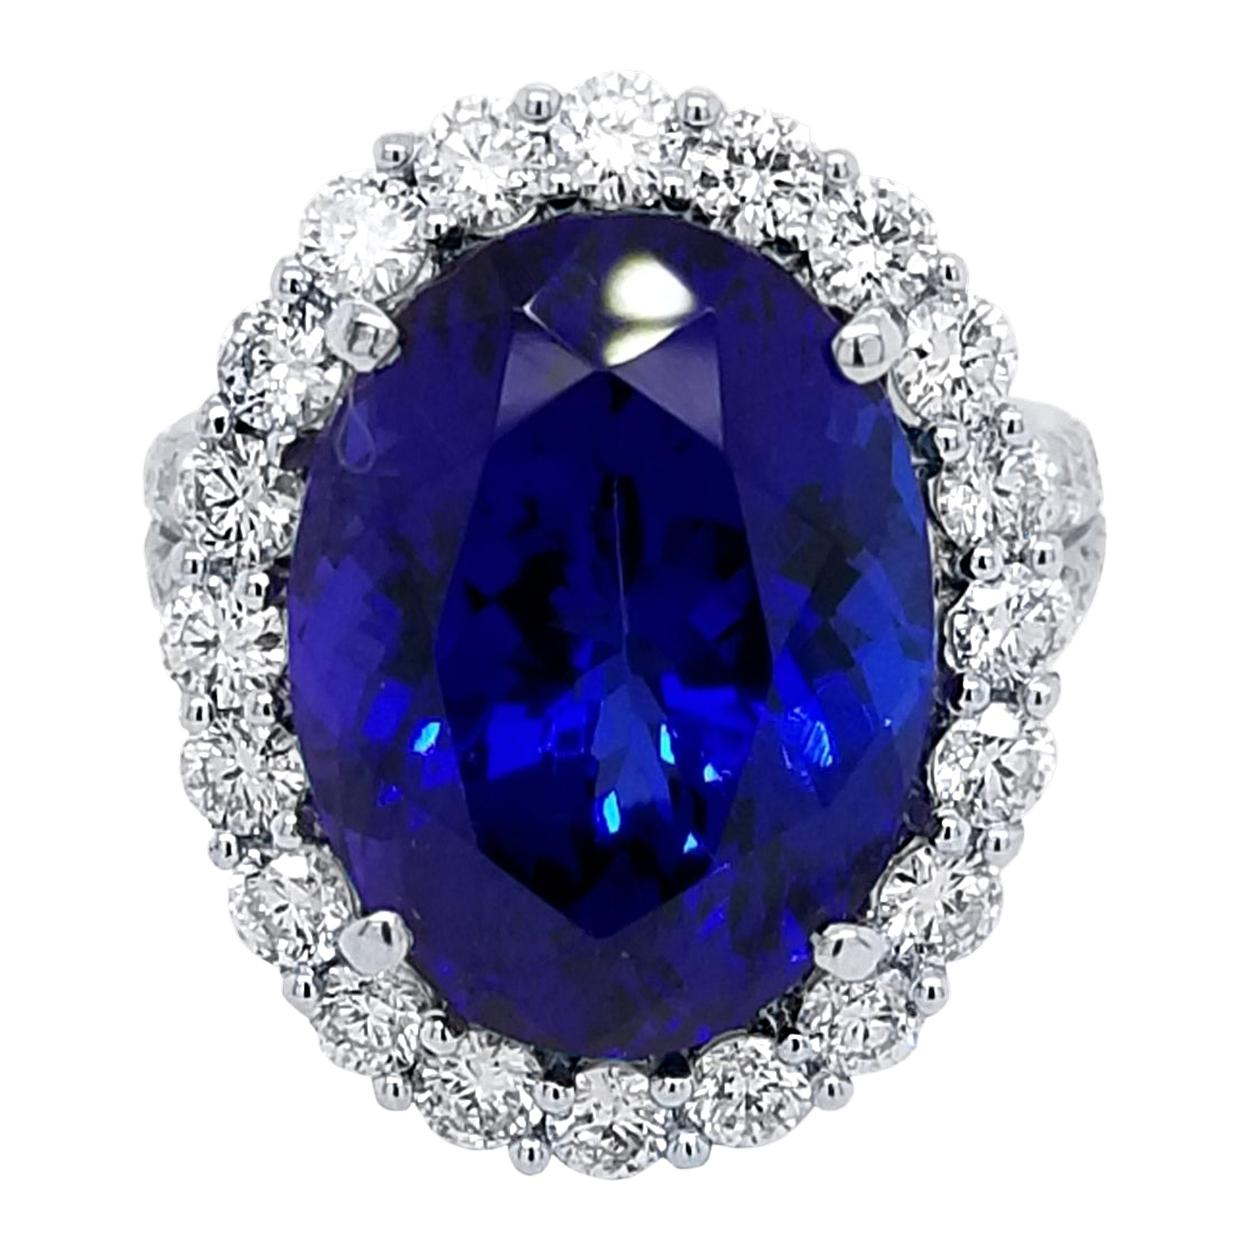 12.6Ct Velvet Blue Oval Tanzanite Split Shank Pave Set Engagement Ring with Halo